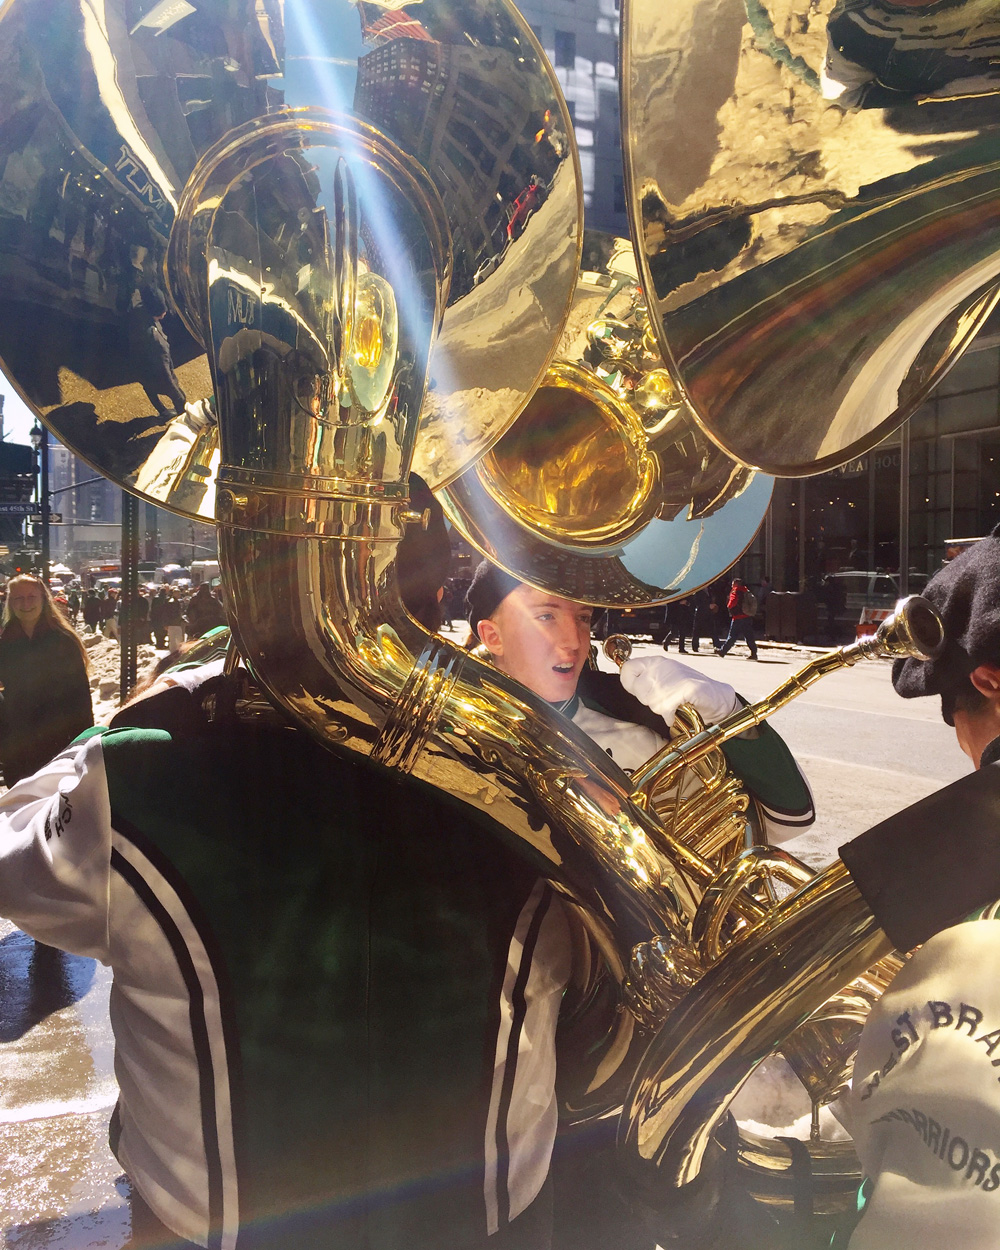 St. Patrick's Day Parade, Snaps